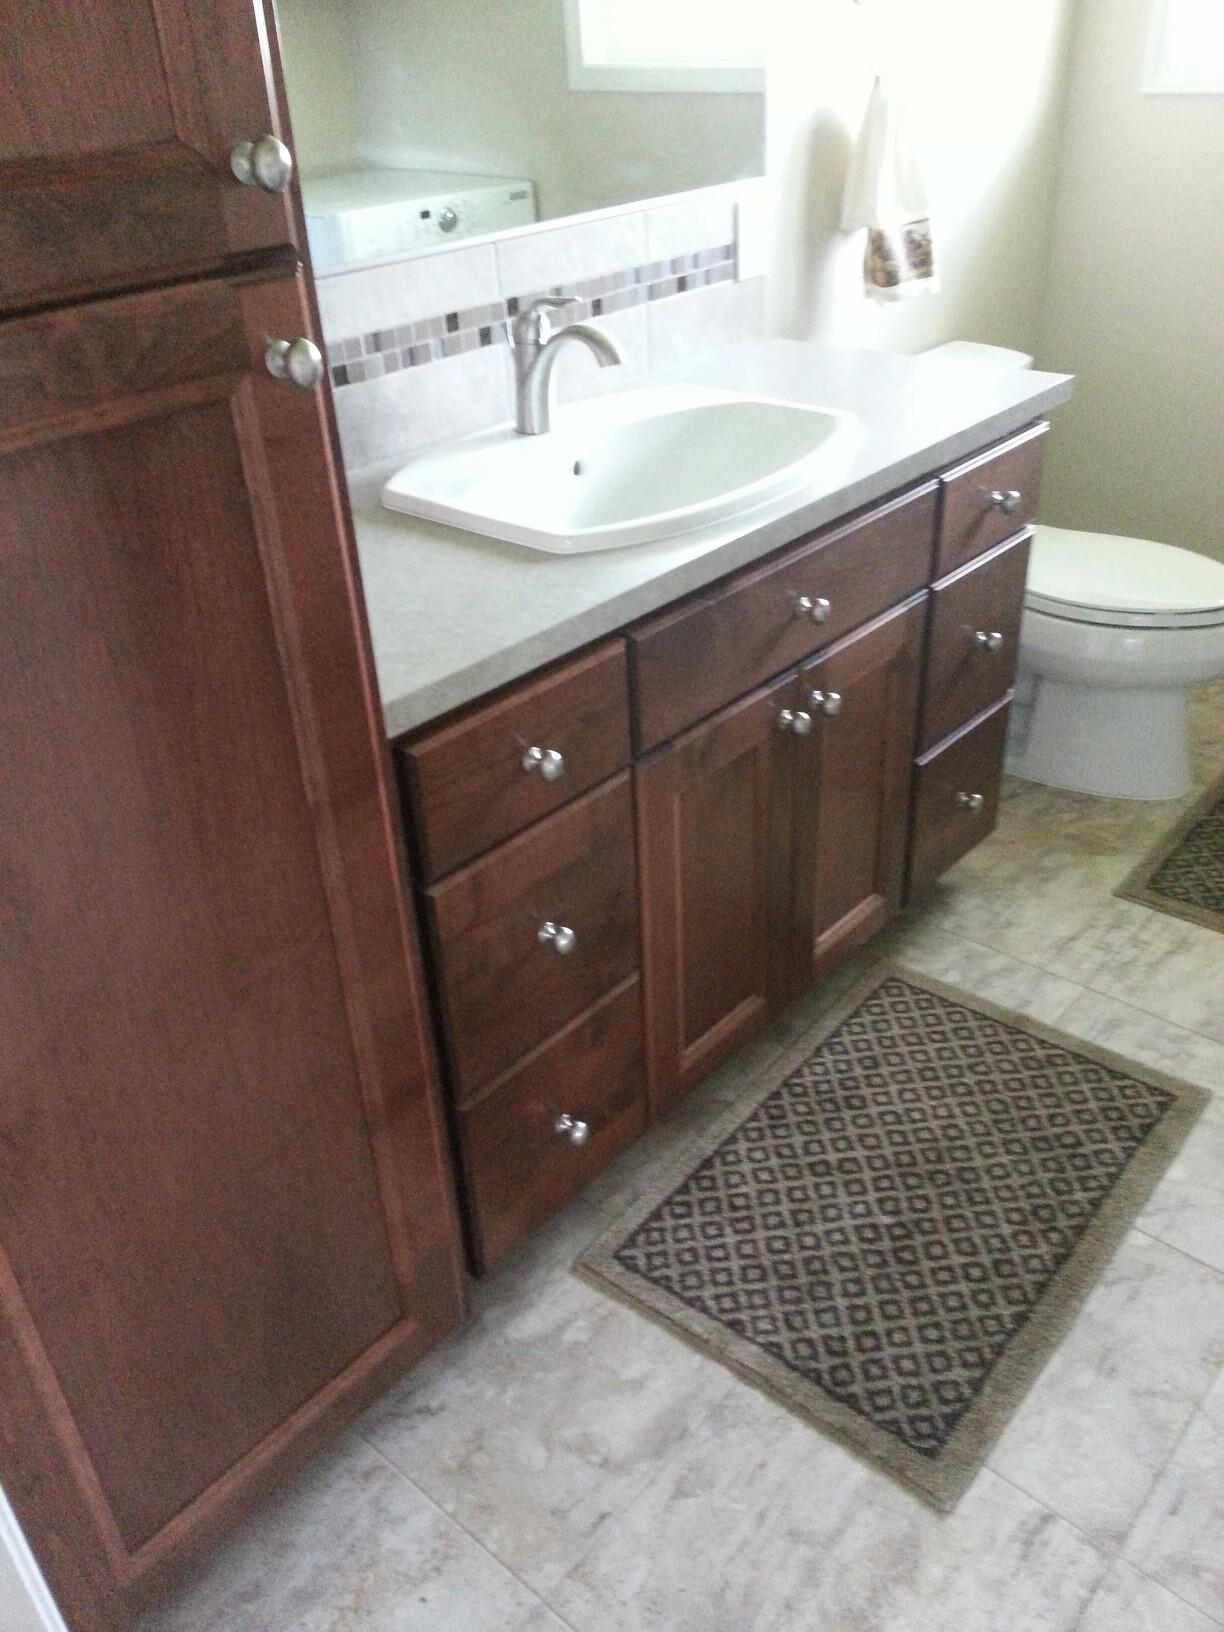 Funke S Custom Cabinets 1482 16th Ave Clarkston Wa 99403 Yp Com